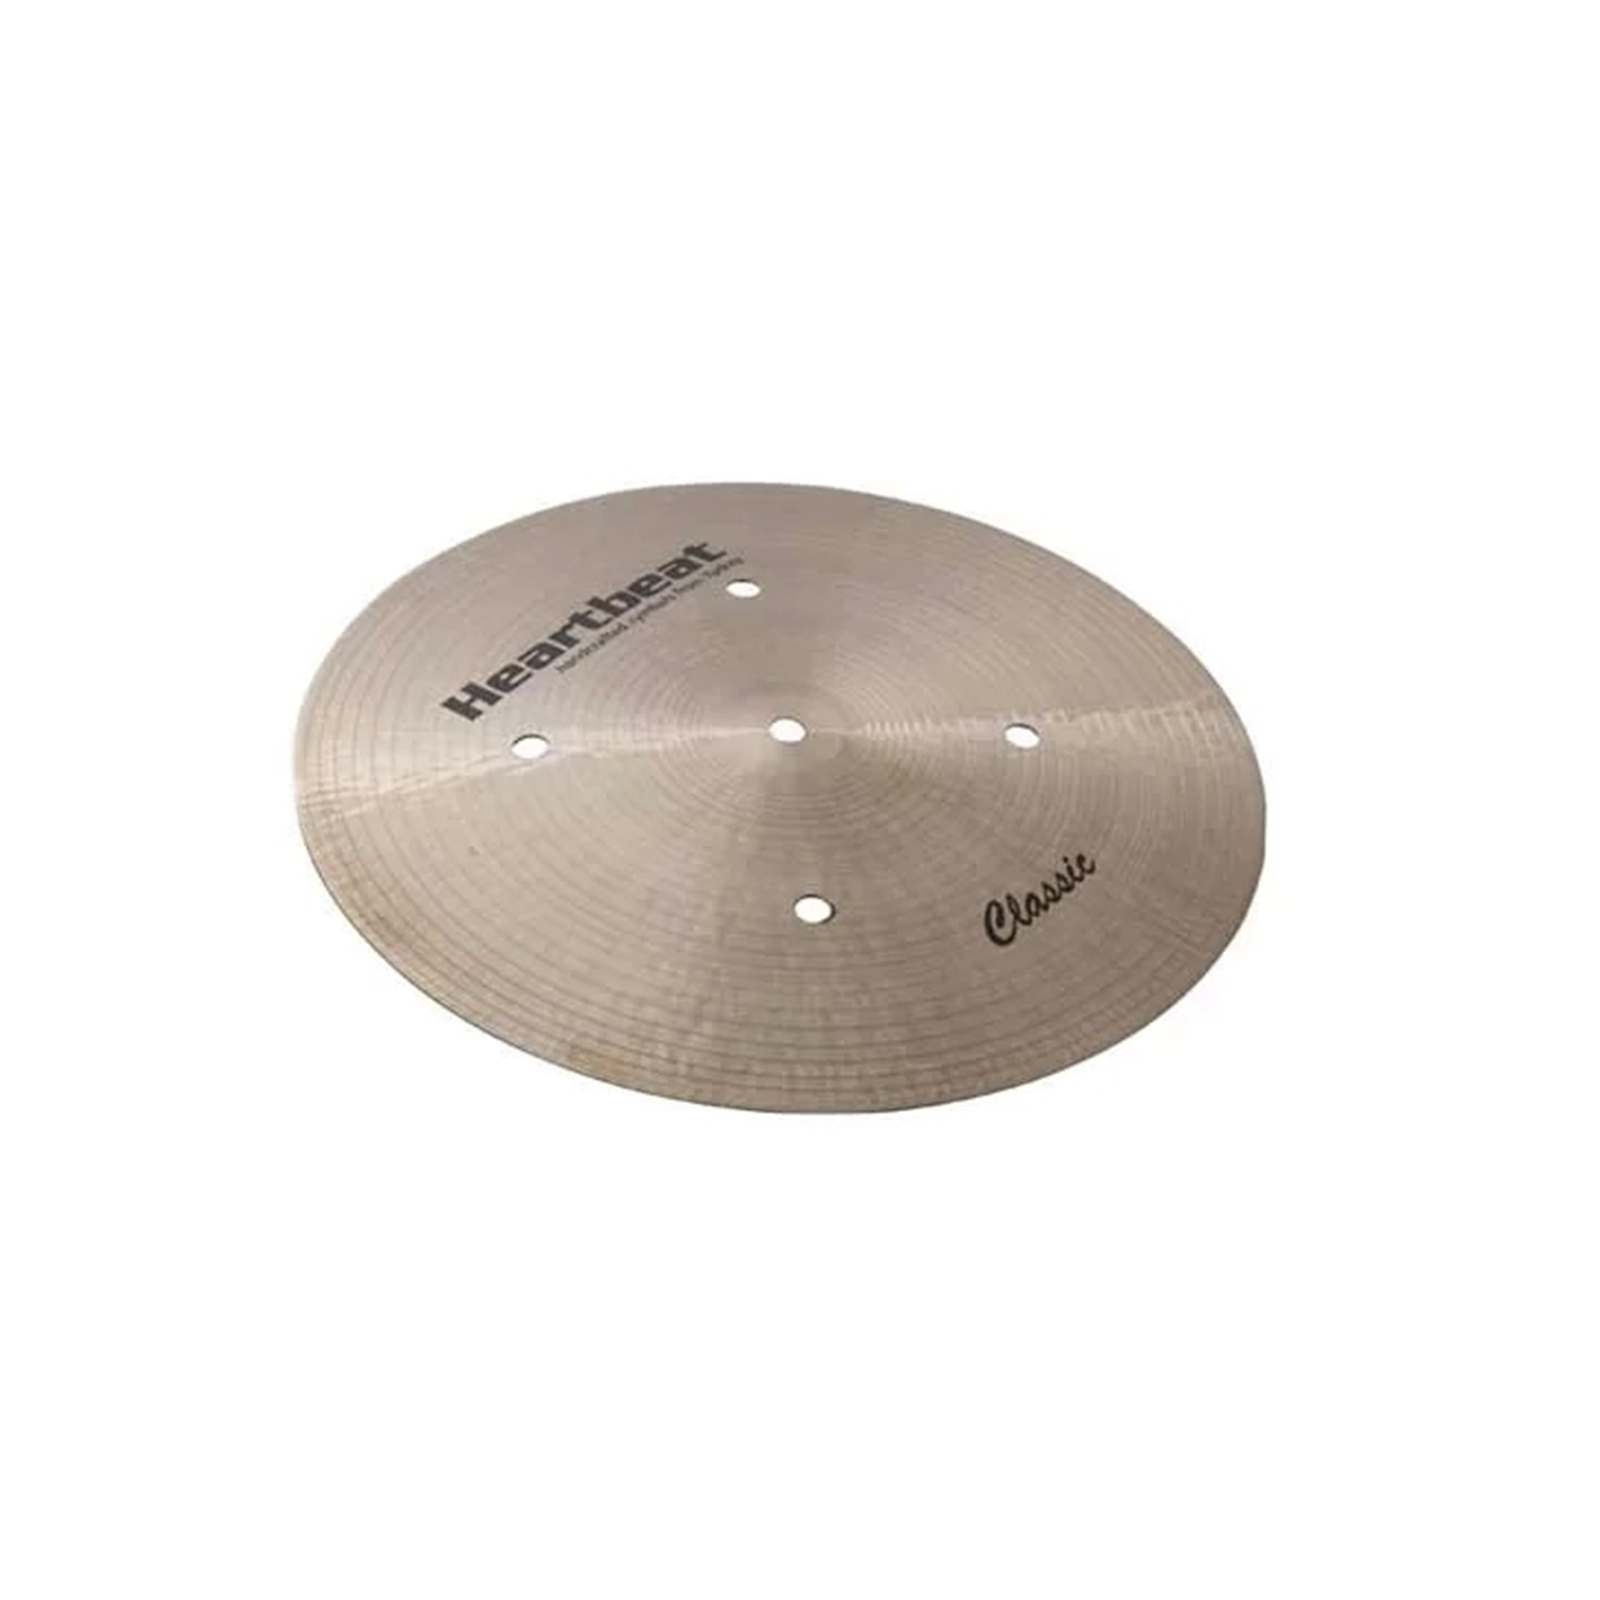 Heartbeat Classic Hi-hat Cymbals